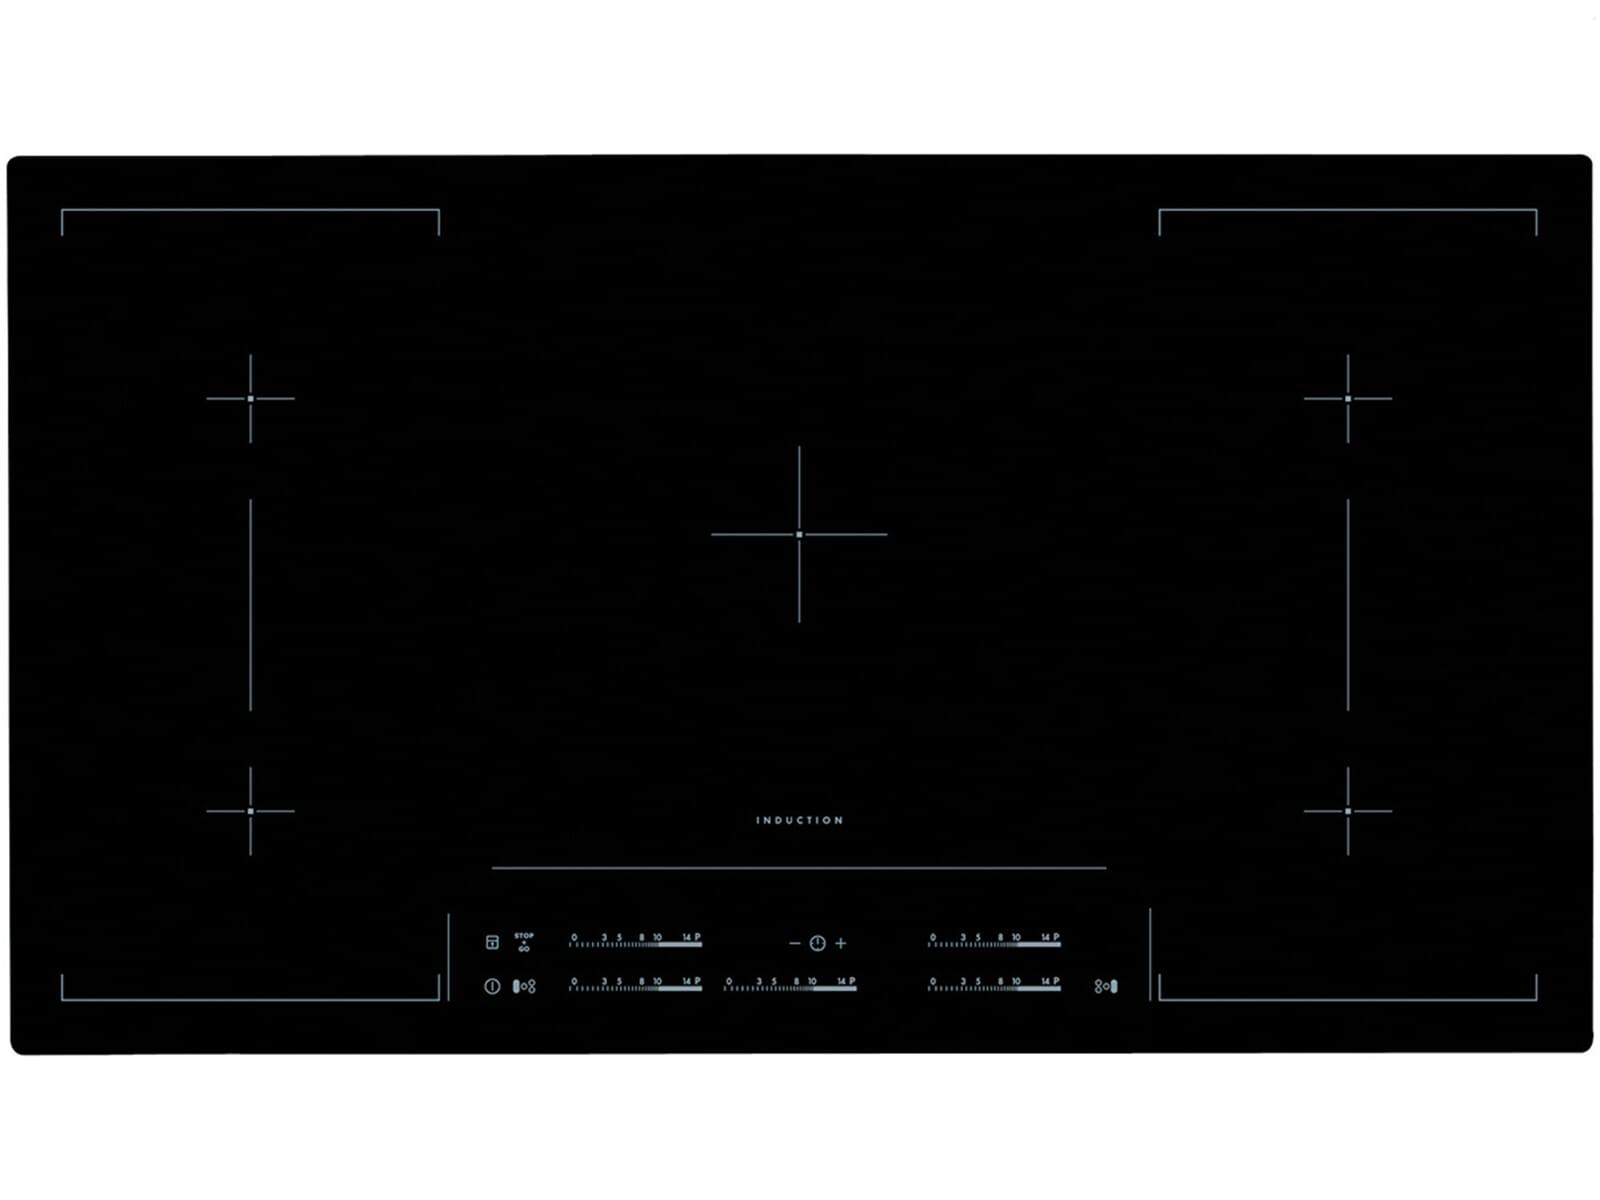 aeg hk955423i b induktion glaskeramik kochfeld autark kochzone rahmenlos 90cm ebay. Black Bedroom Furniture Sets. Home Design Ideas